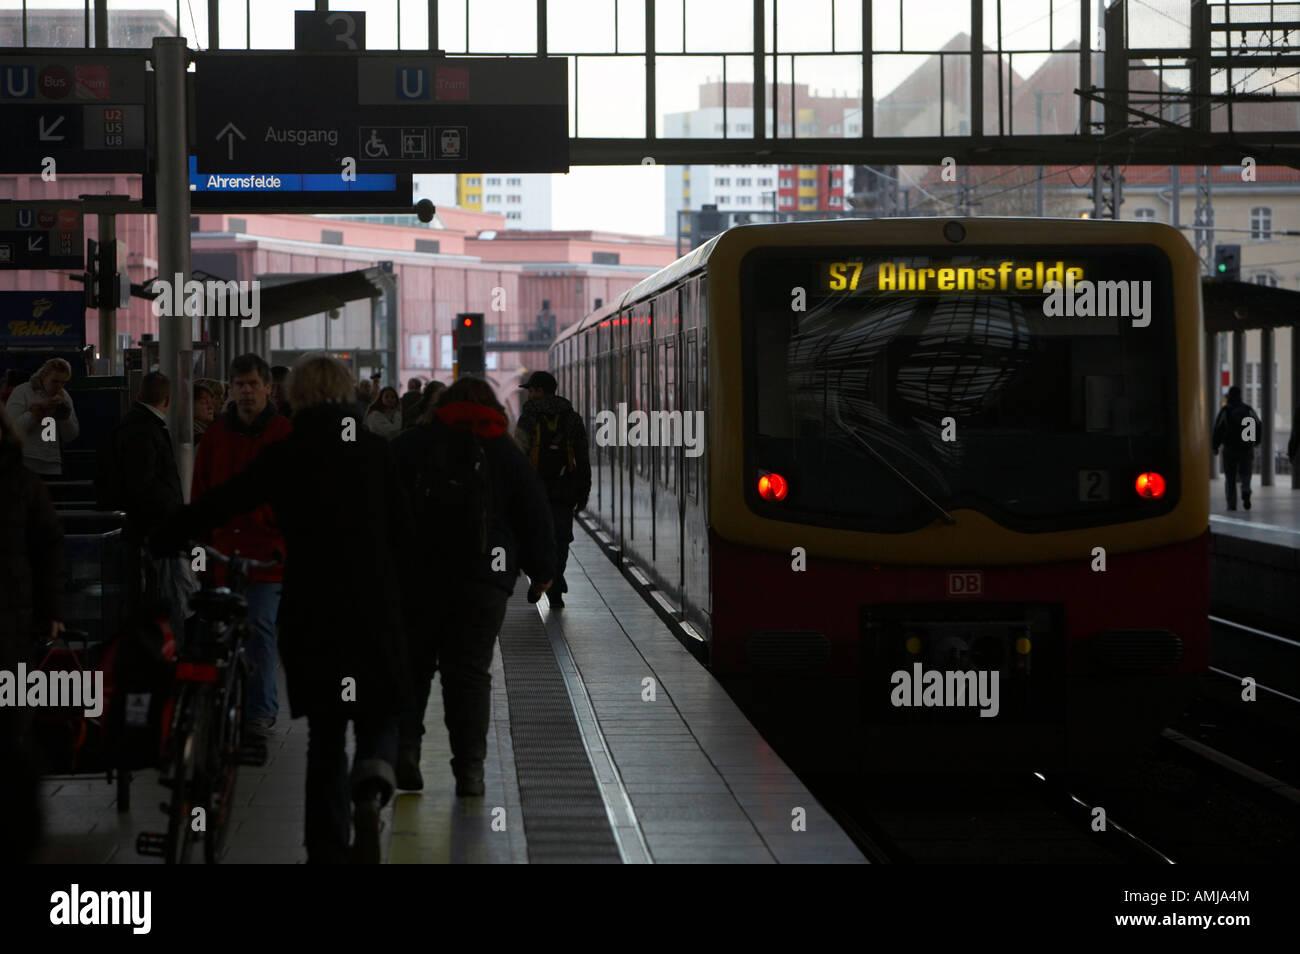 S Bahn train leaving Alexanderplatz station Berlin Germany Stock Photo